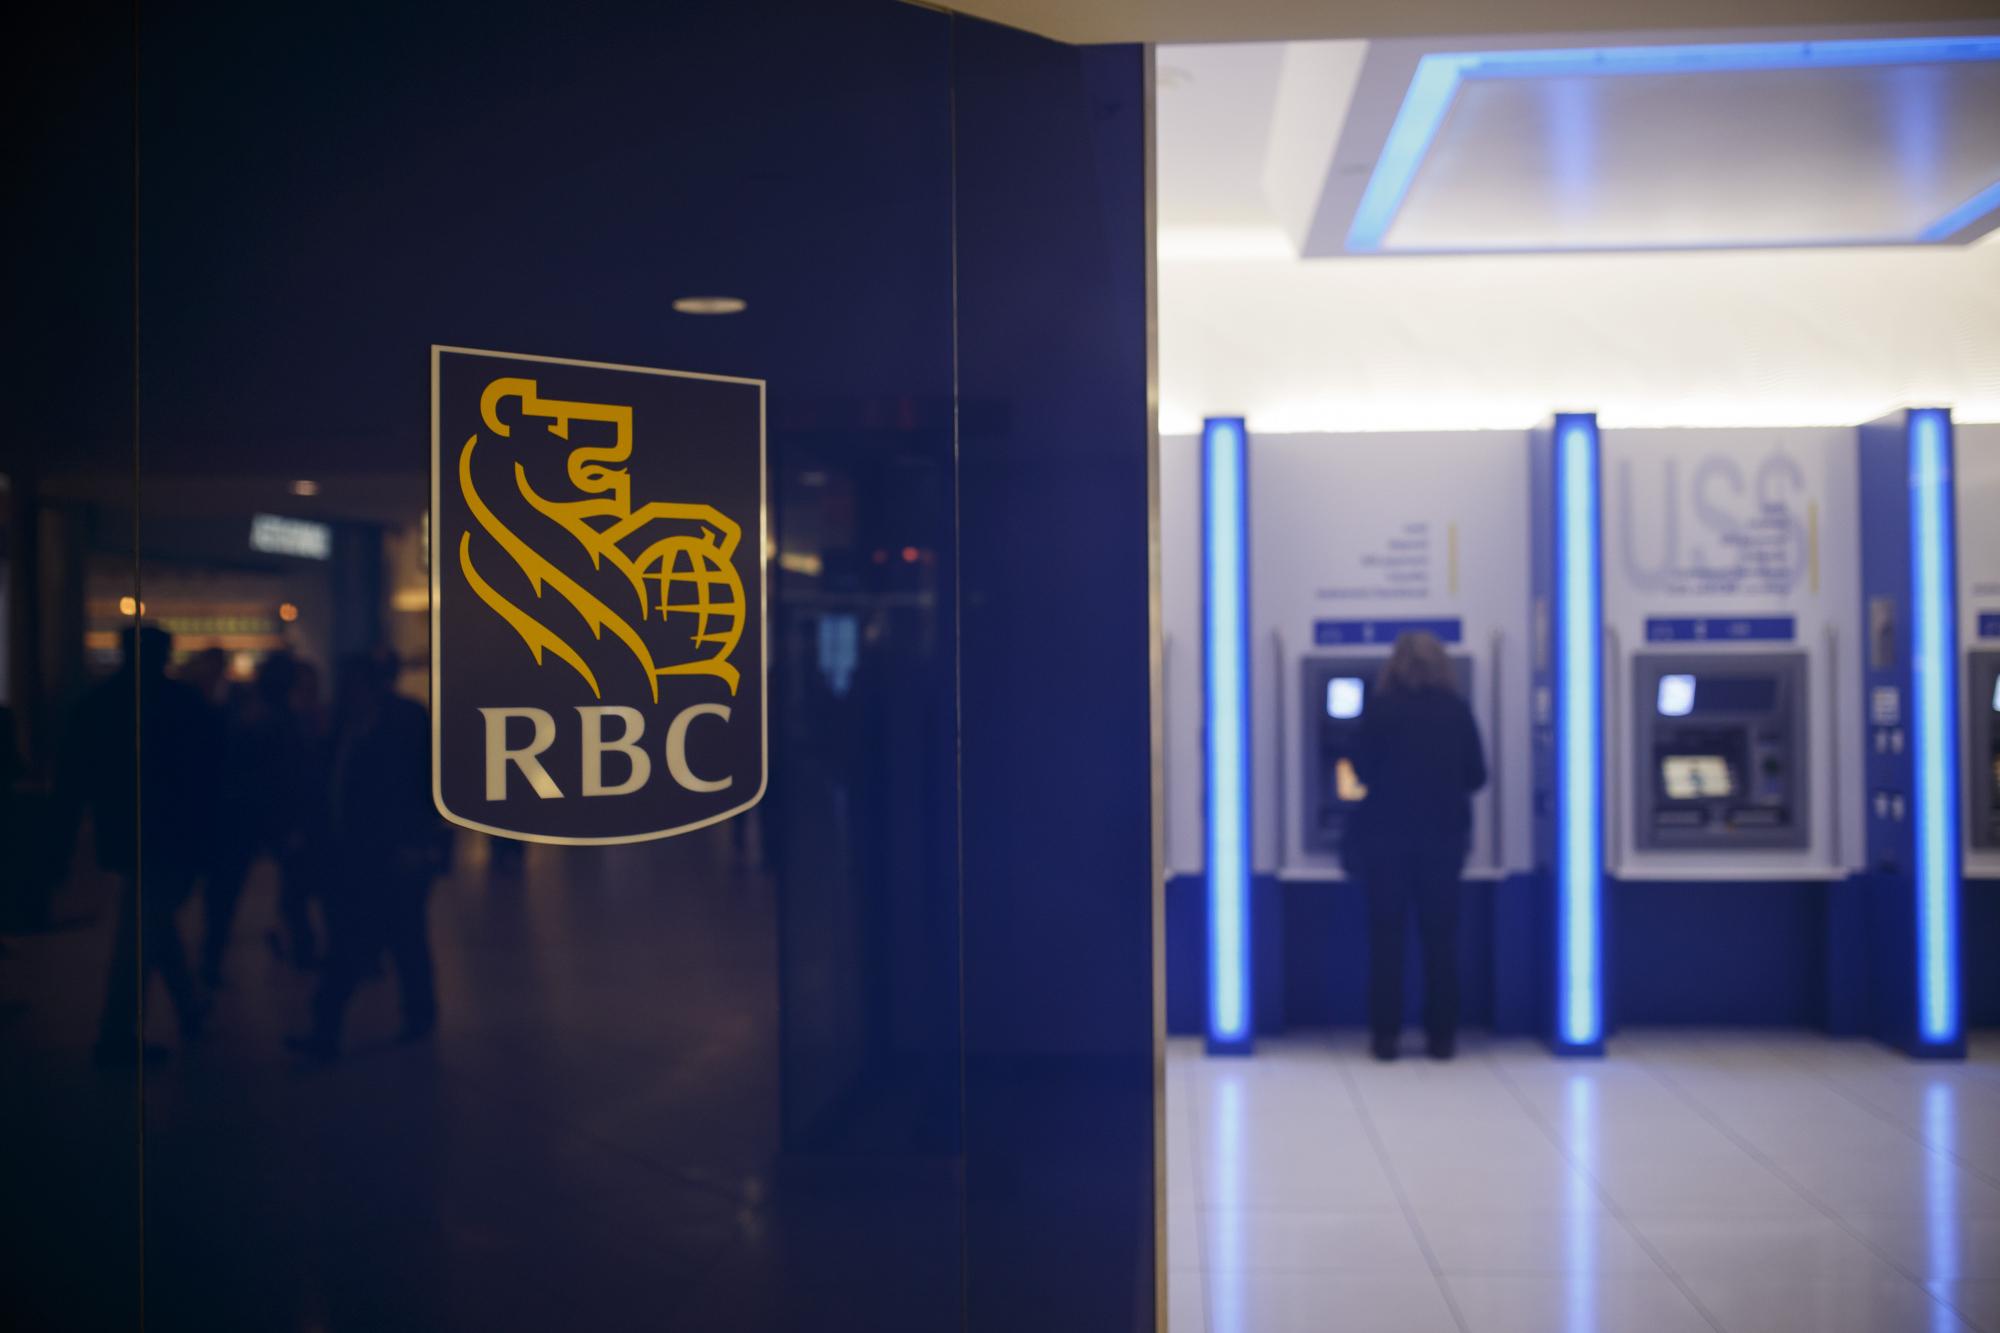 Rytoronto Stock Quote Royal Bank Of Canada Bloomberg Markets